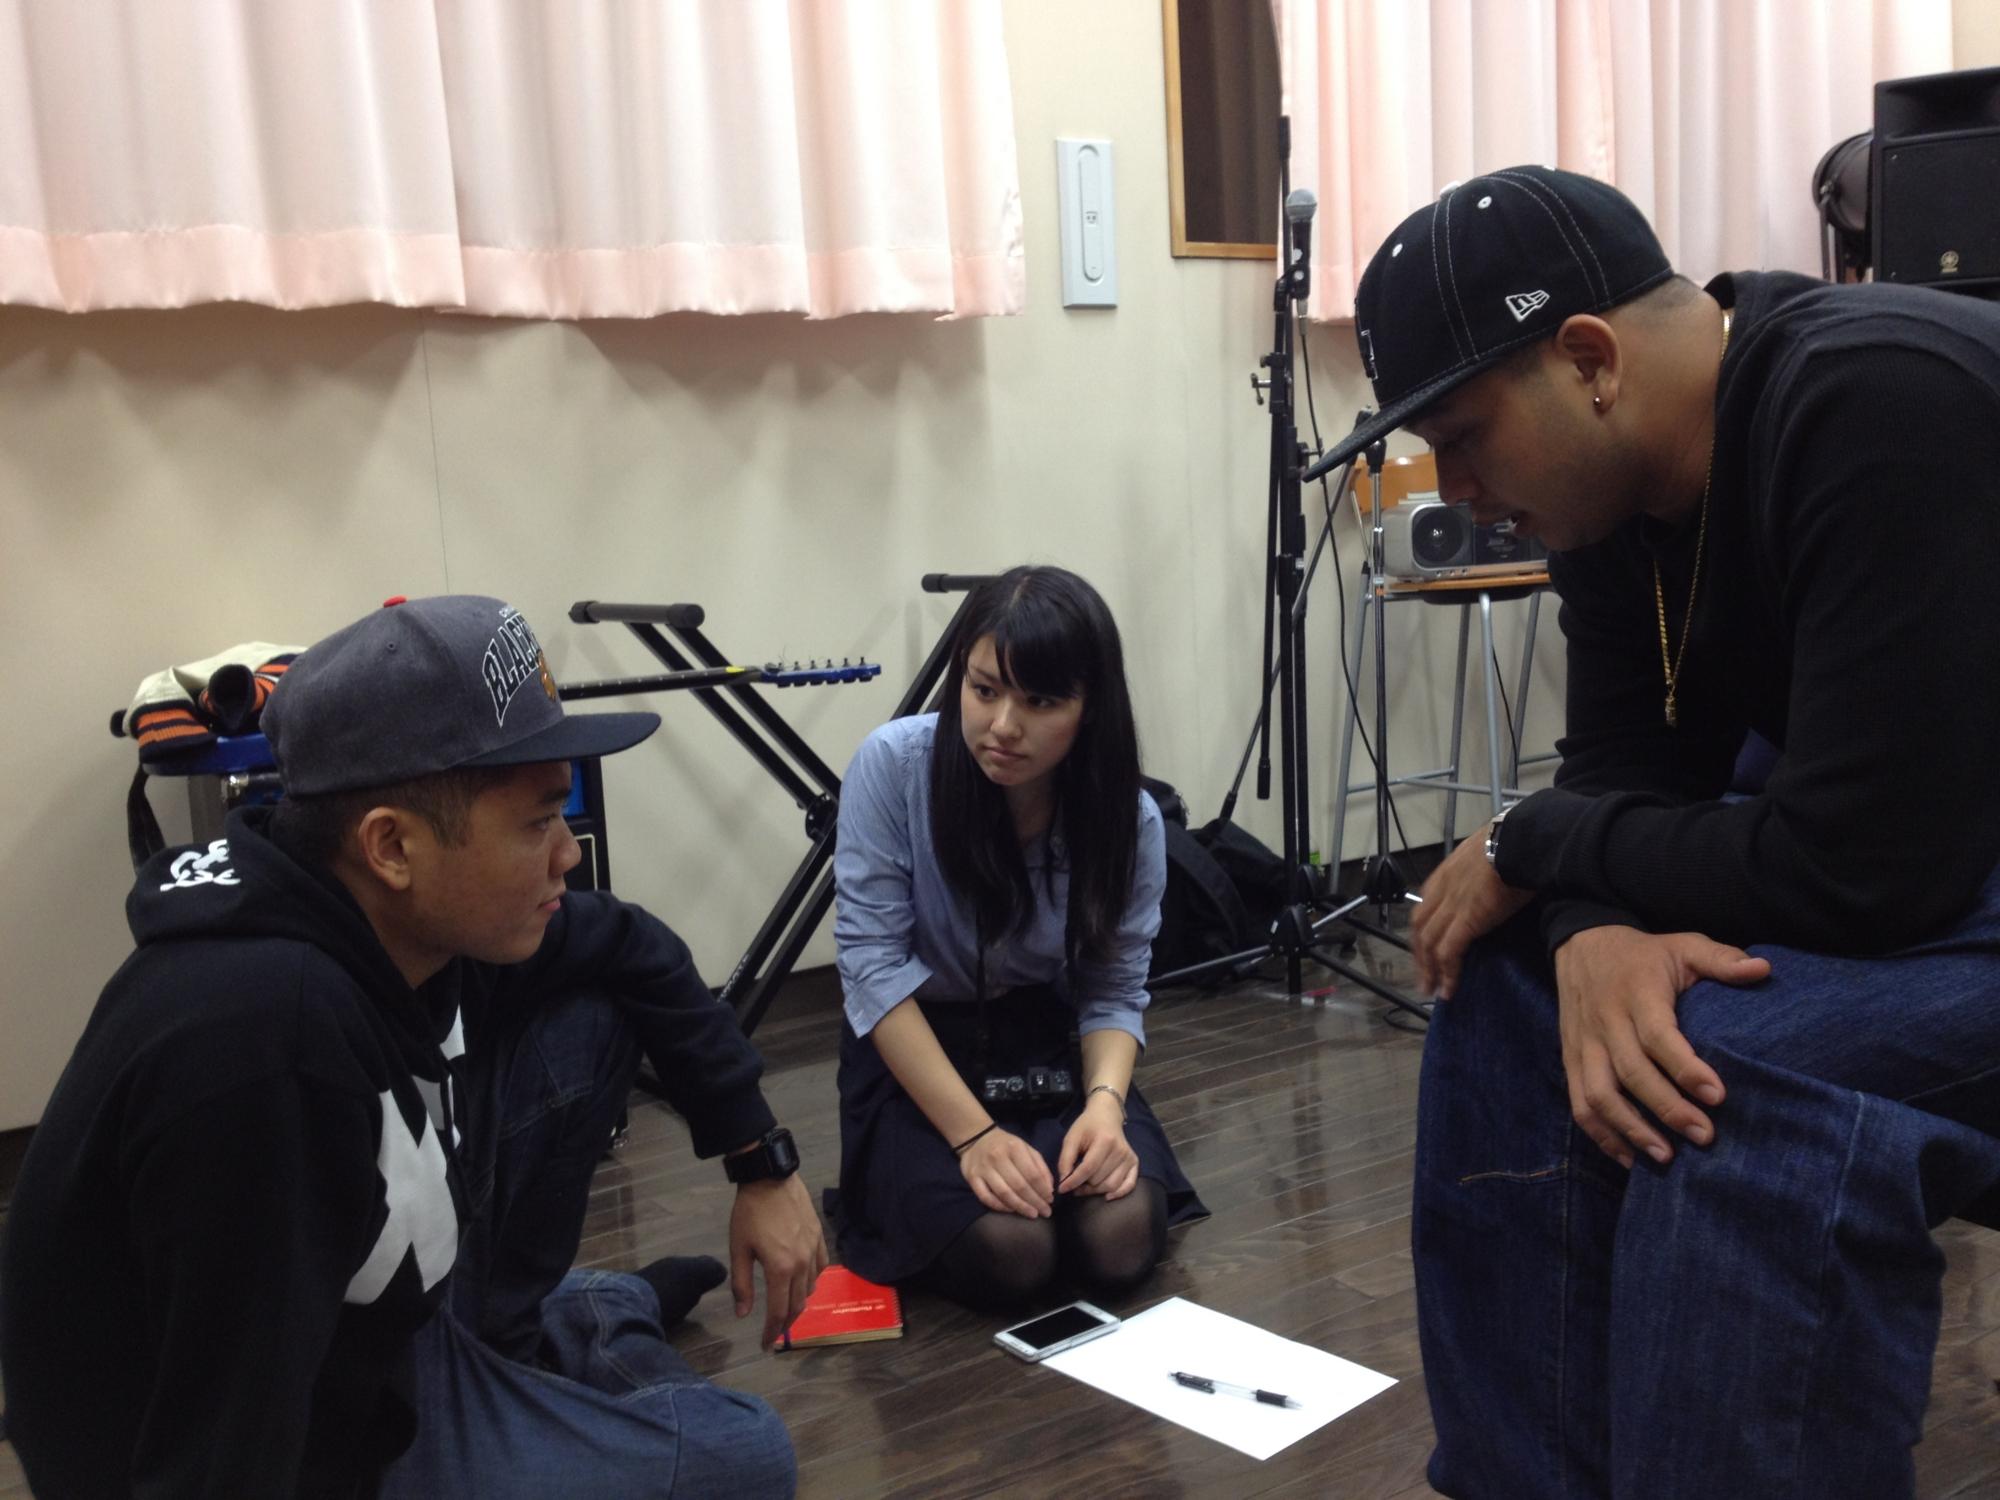 f:id:japanfoundation:20121030120548j:image:w640